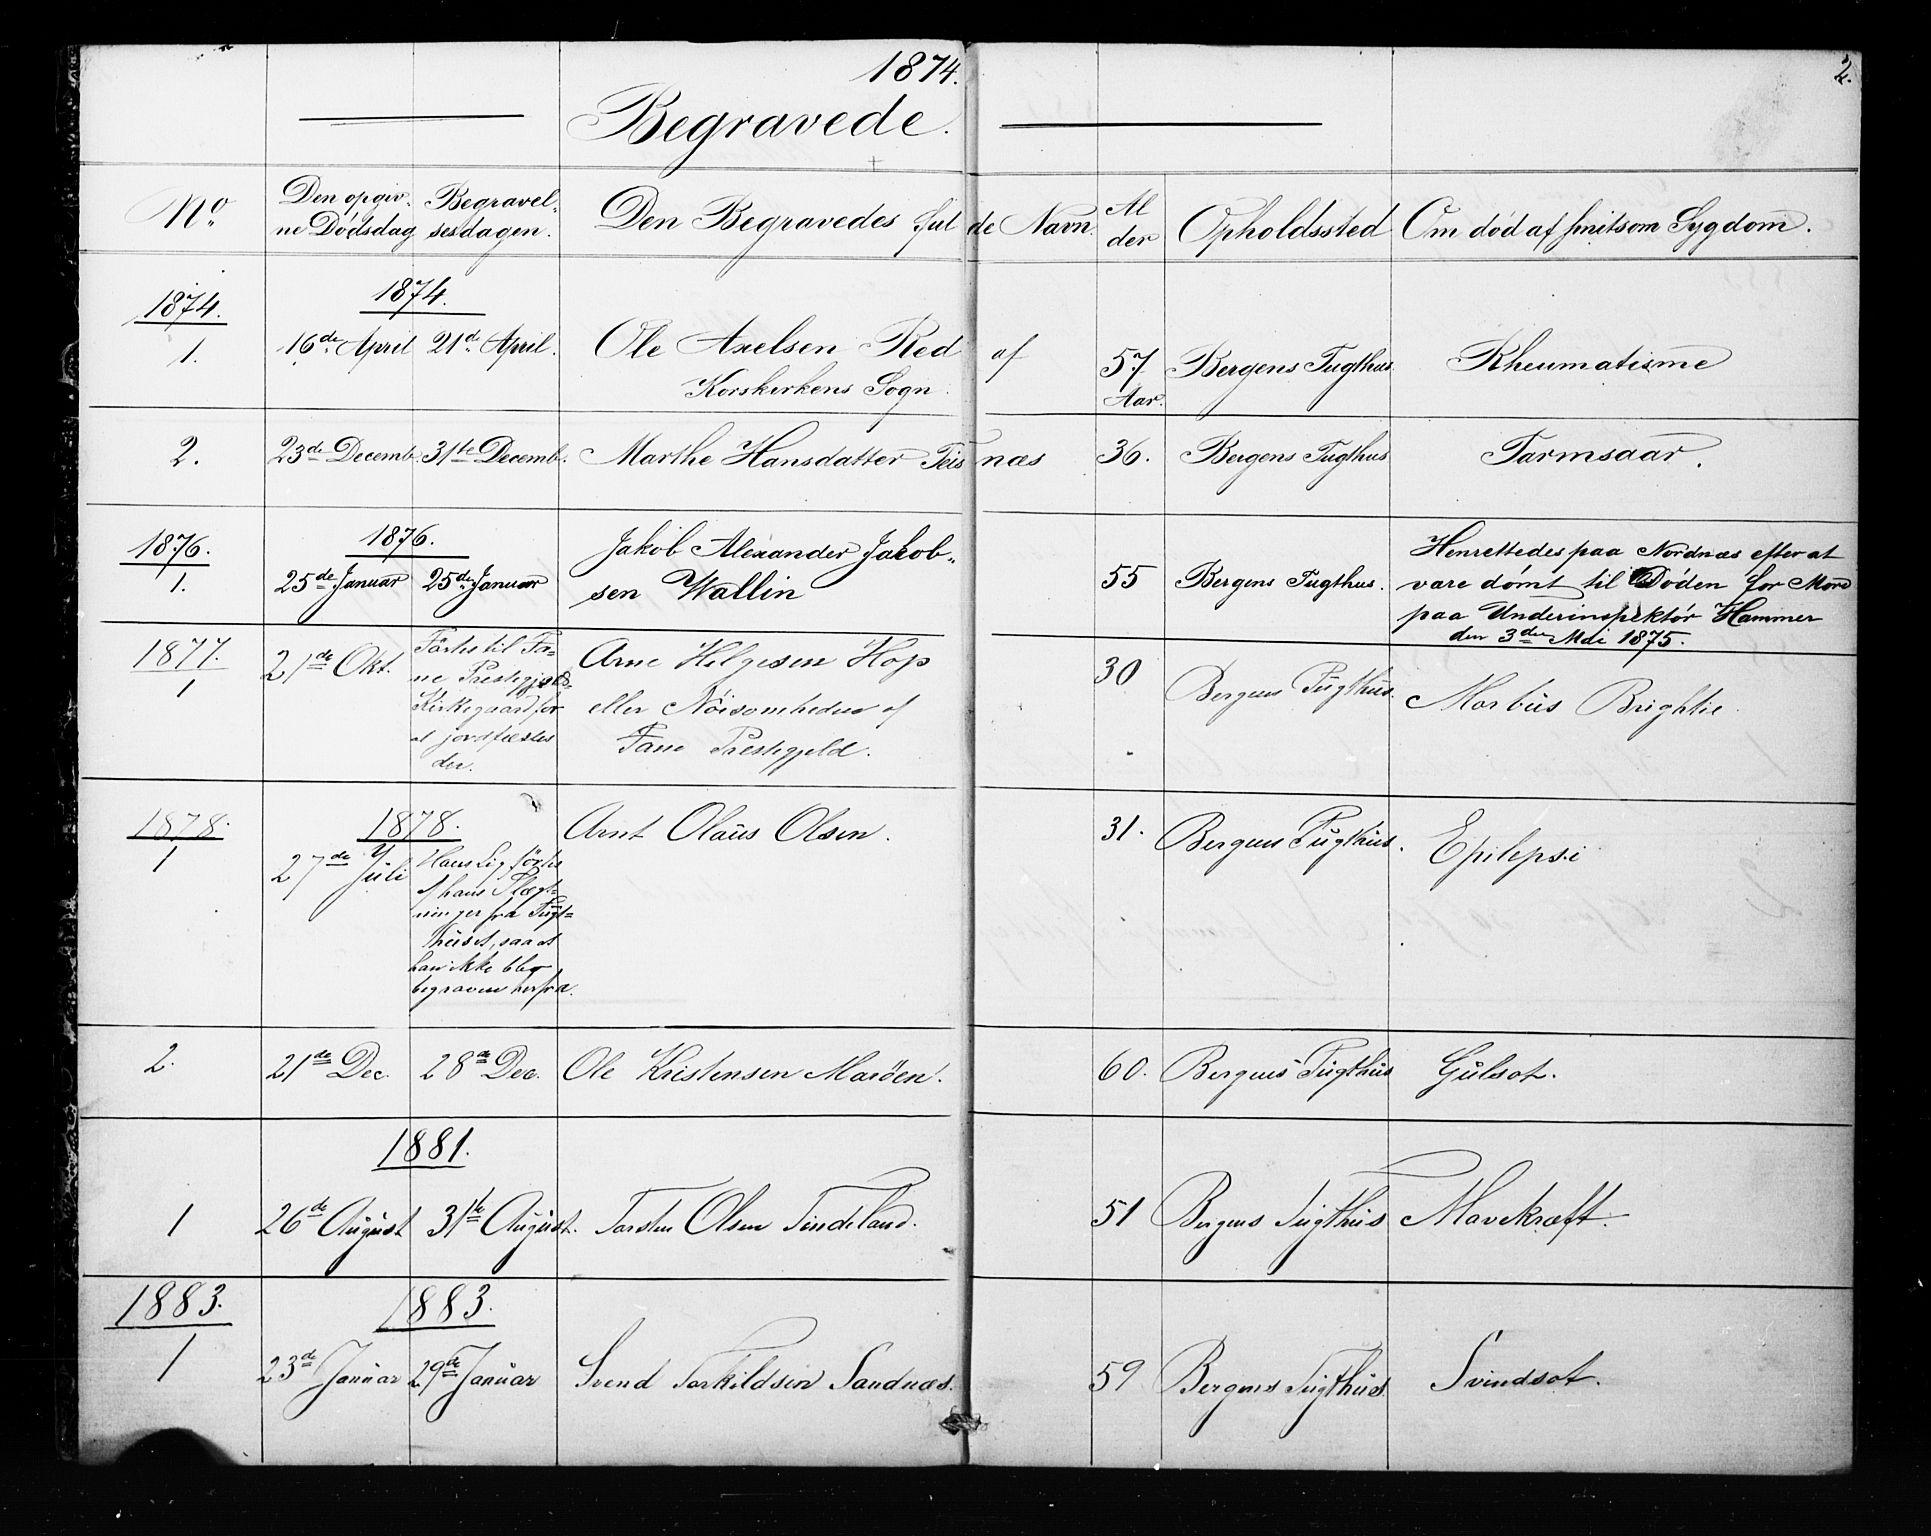 SAB, Bergens strafanstalts sokneprestembete*, Parish register (copy) no. A 1, 1874-1884, p. 2